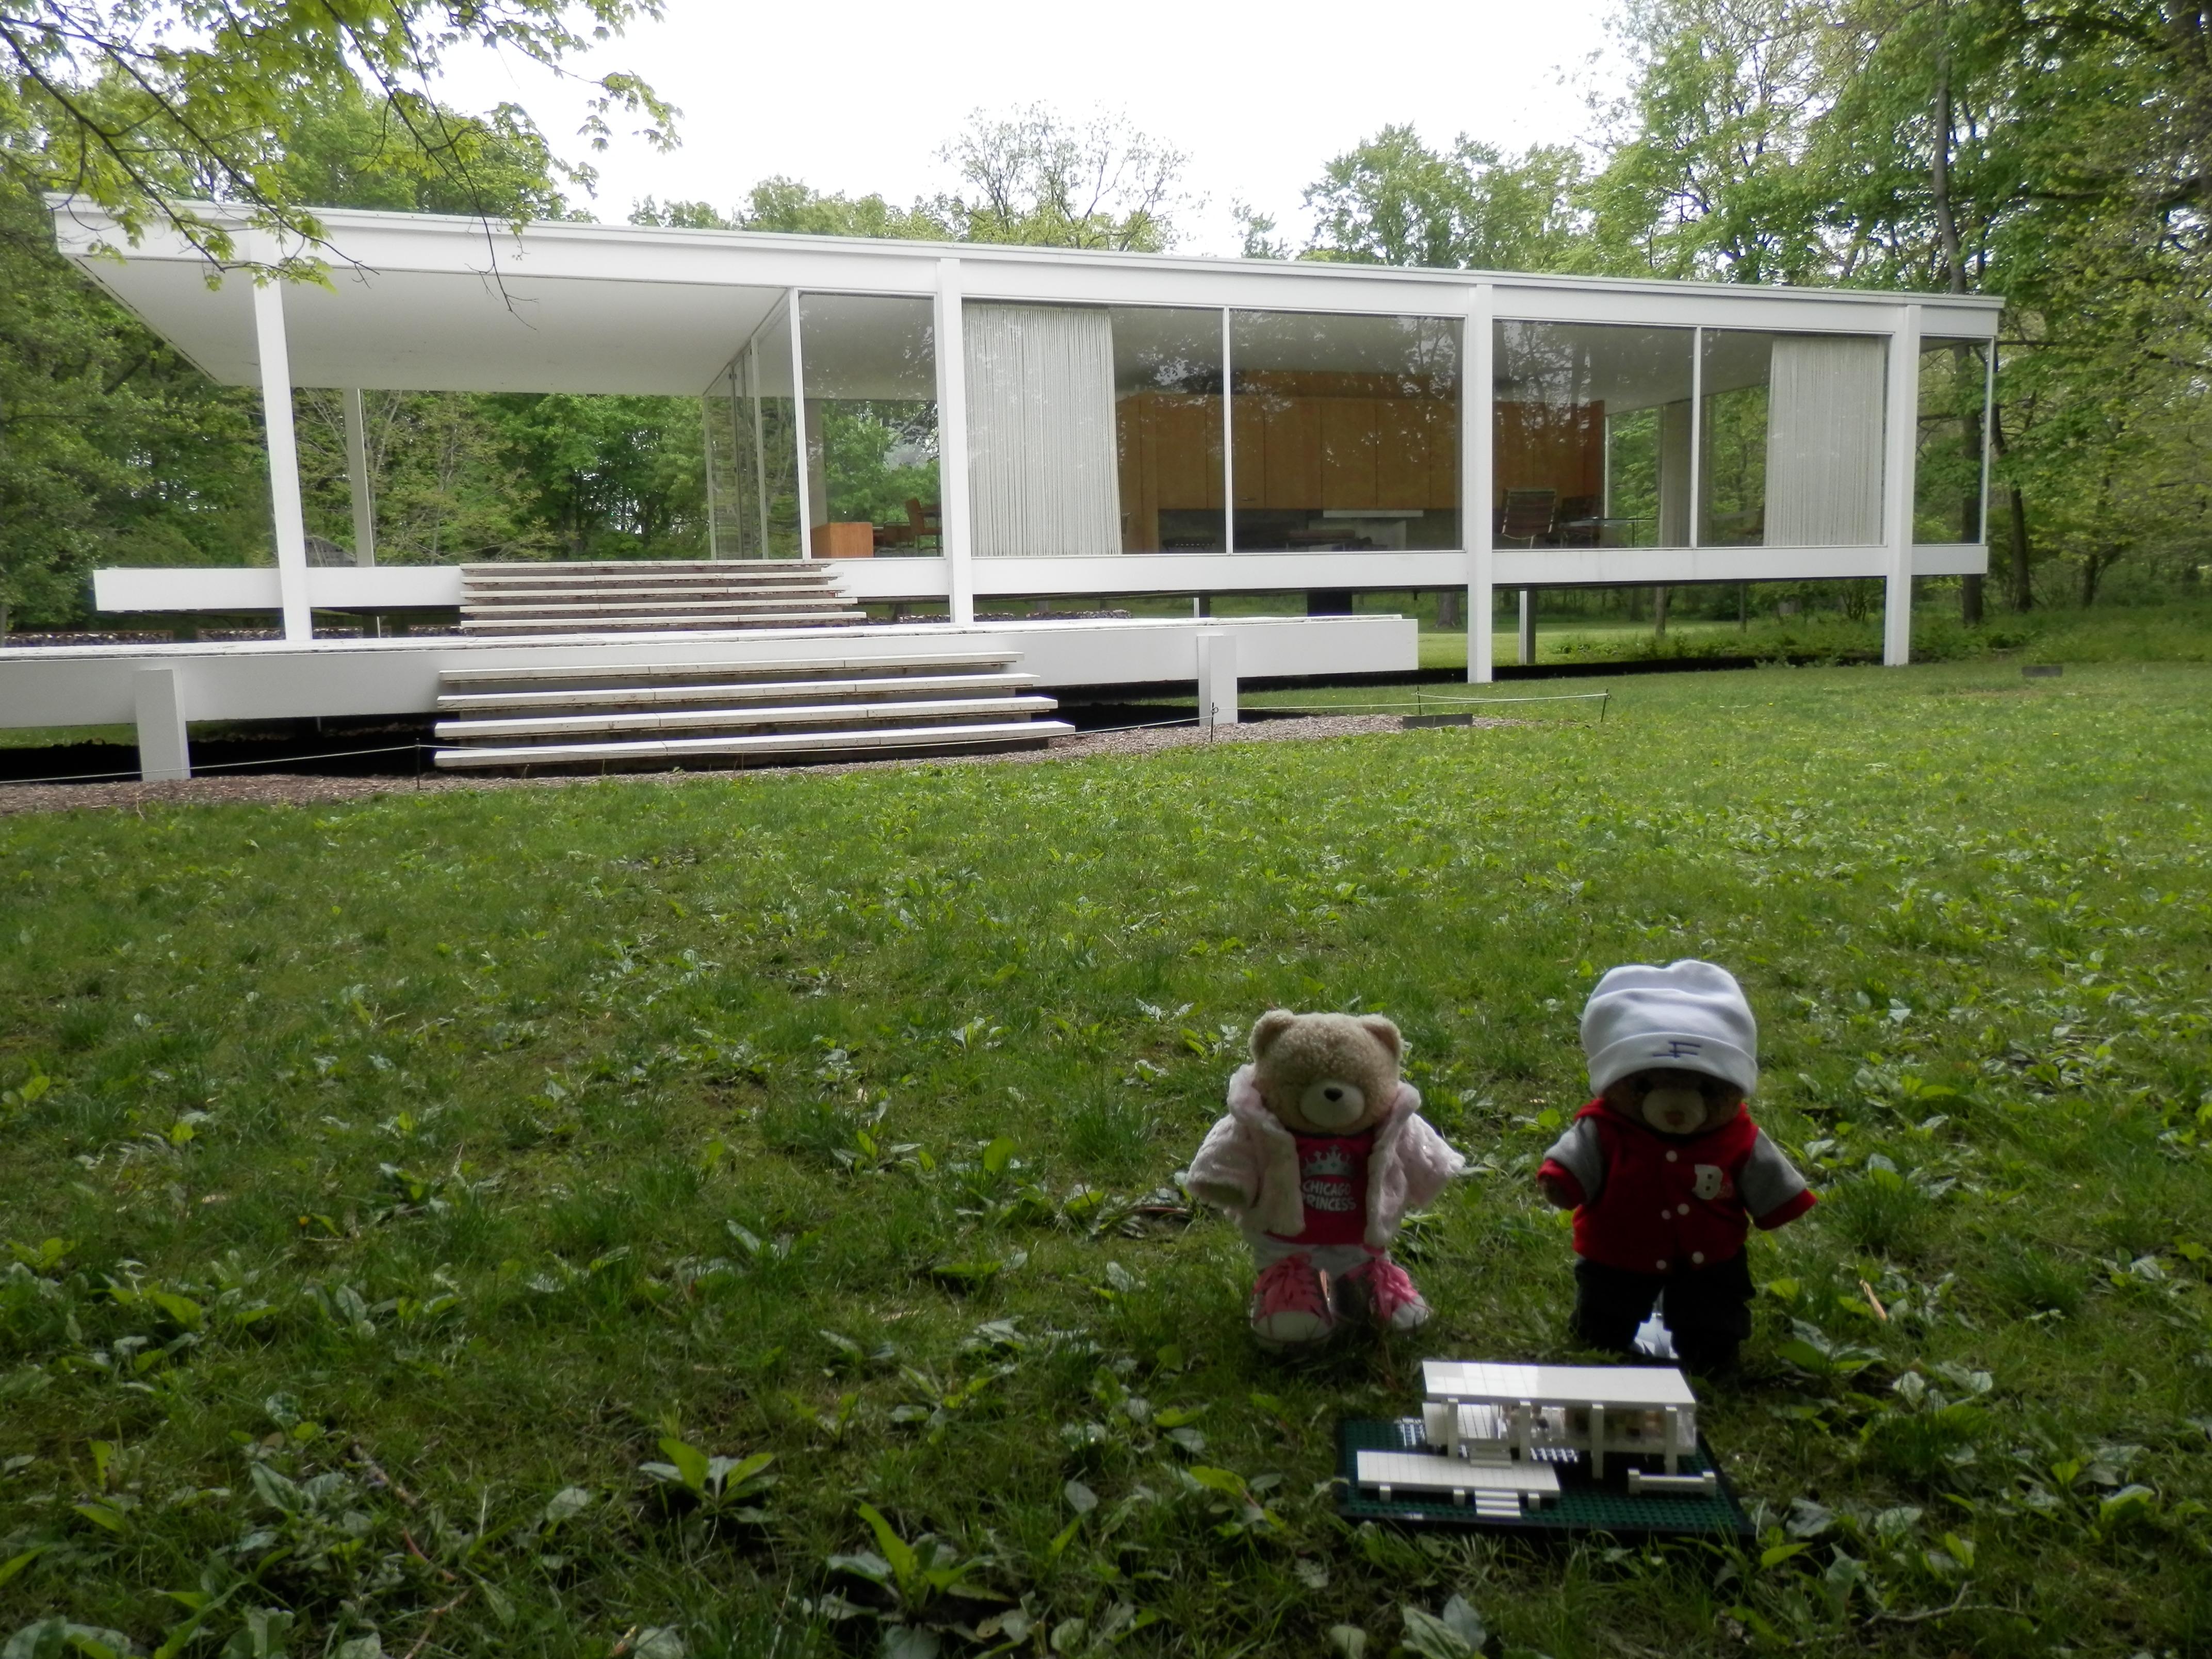 farnsworth house pufflesandhoneyadventures